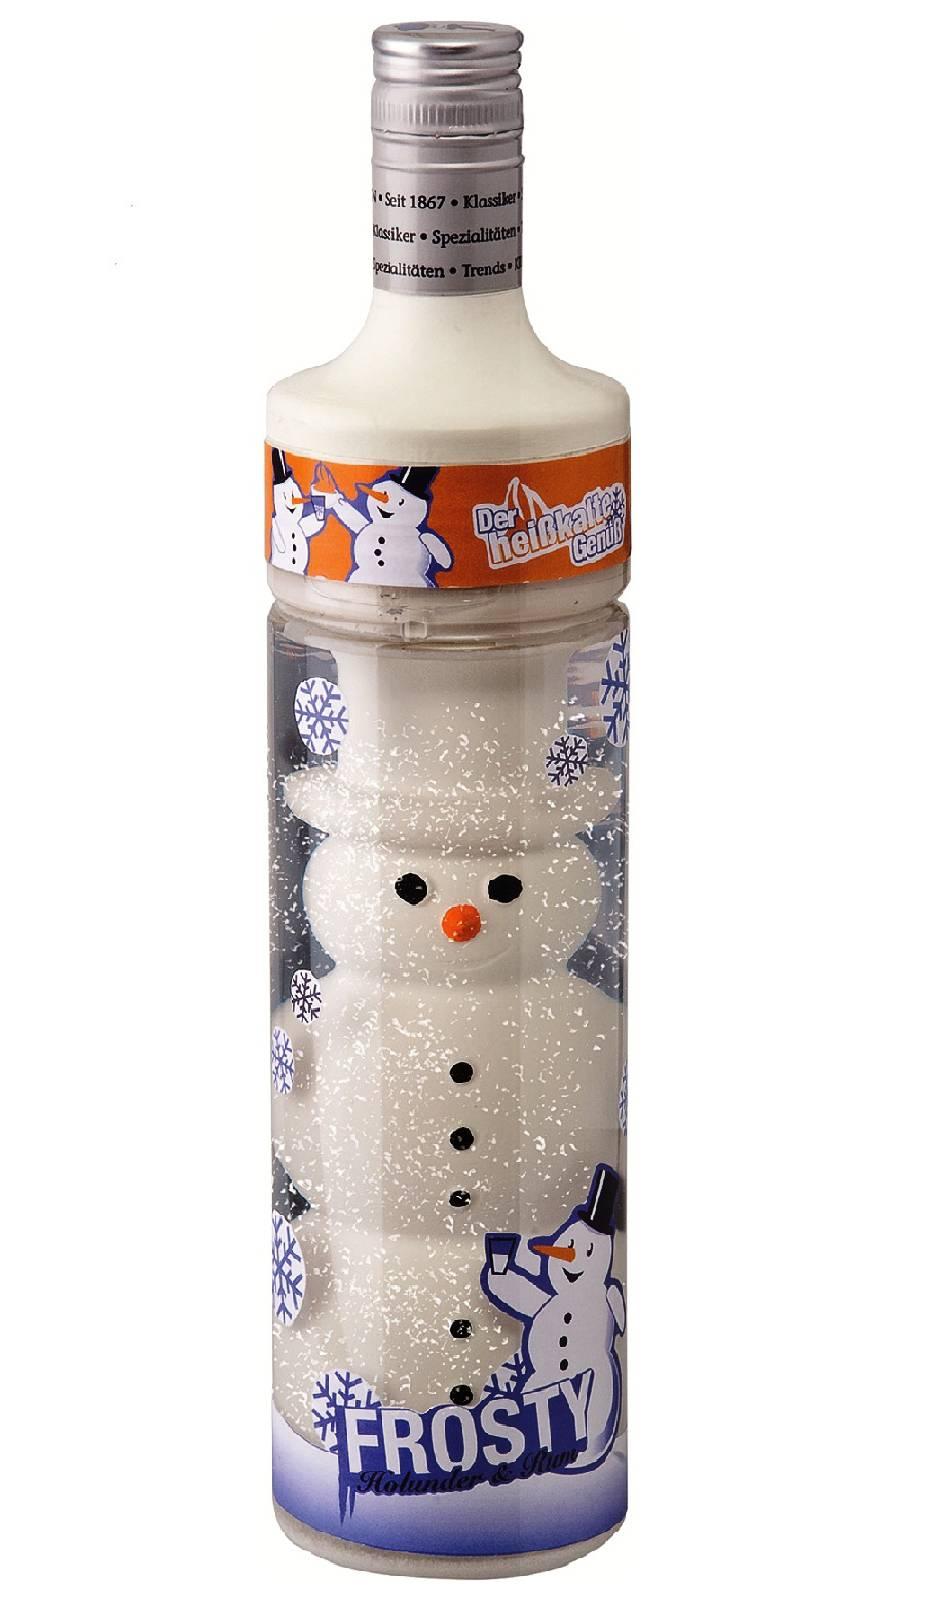 Frosty's Holunder mit Rum Likör 15 % vol Spaßlikör 0,5 l